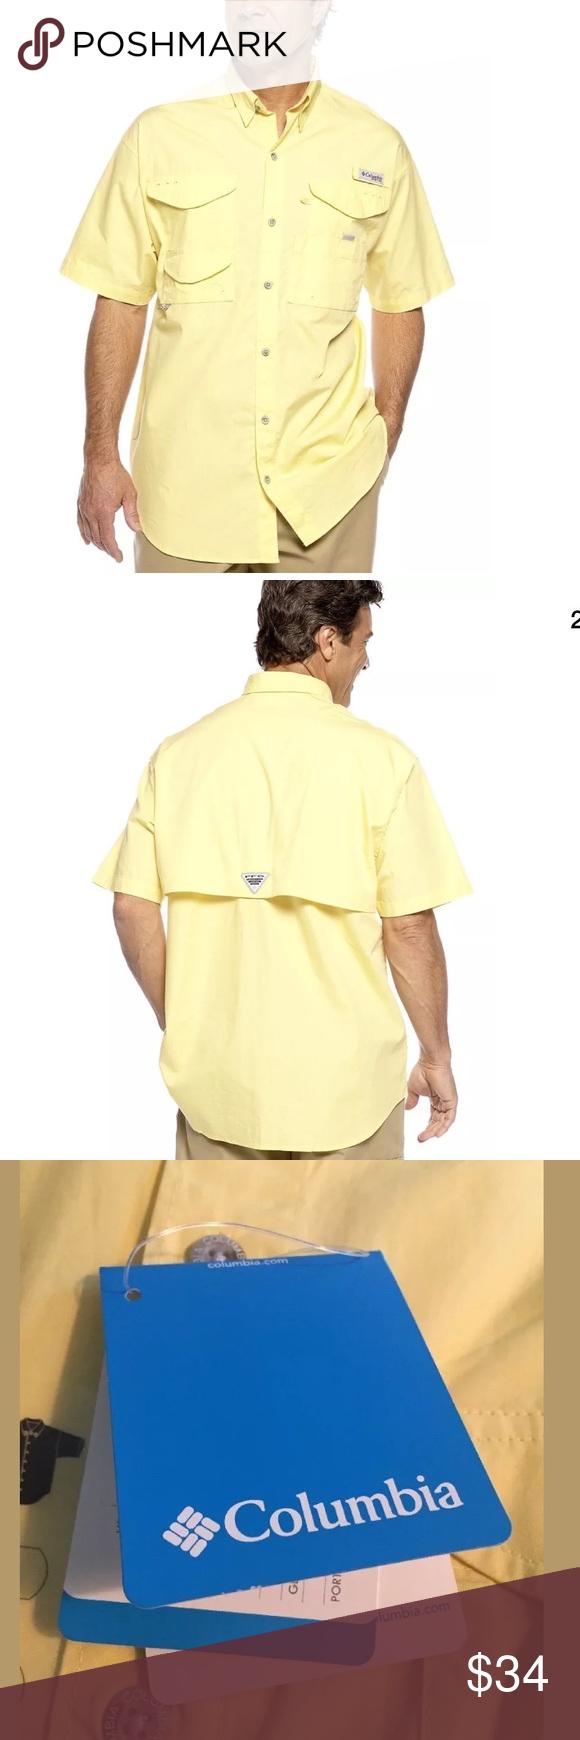 d06d12edbe6 Men's Columbia Size M Yellow PFG Shirt NEW Men's Columbia Size M Yellow PFG  Bonehead Vented